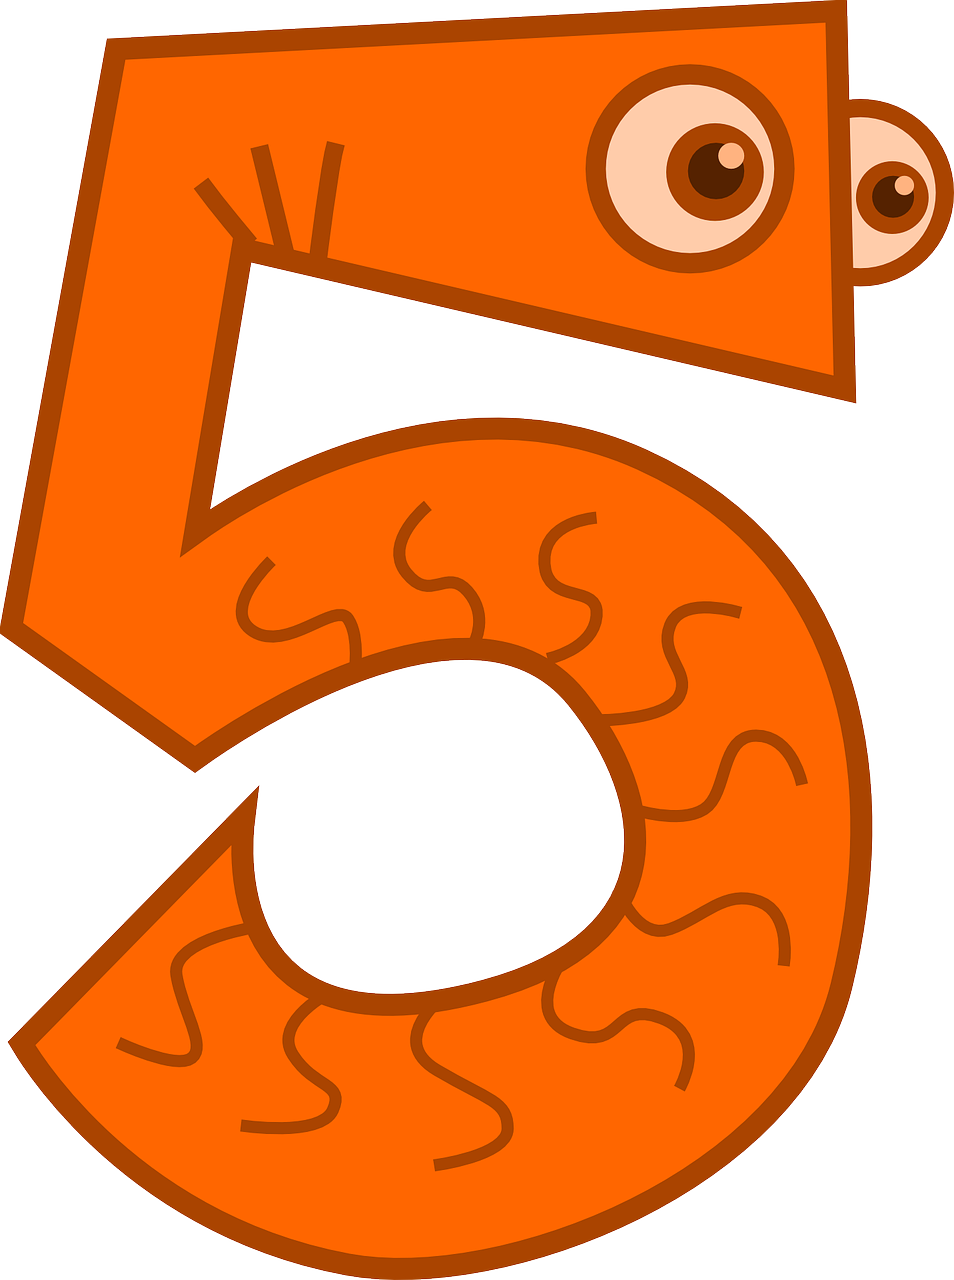 Цифра 5 - картинка, трафарет для распечатывания